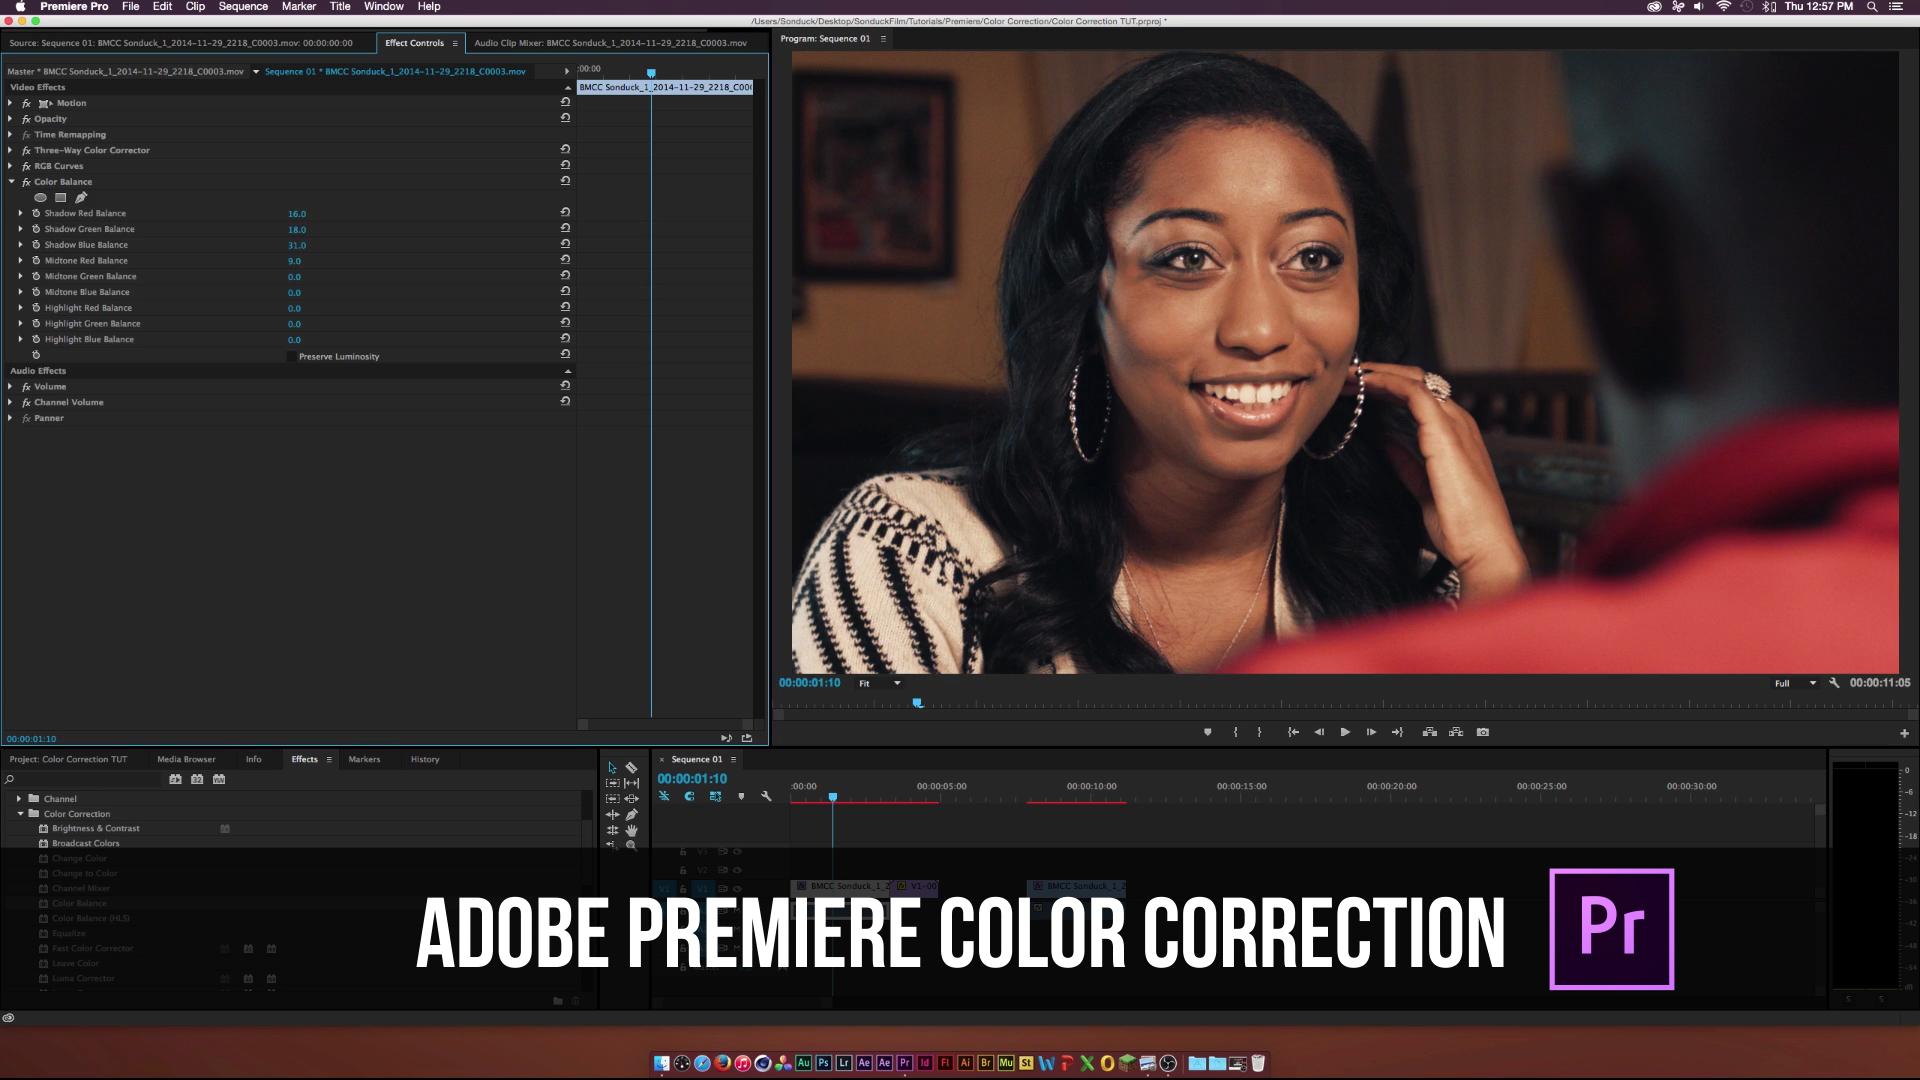 Adobe Premiere TUT